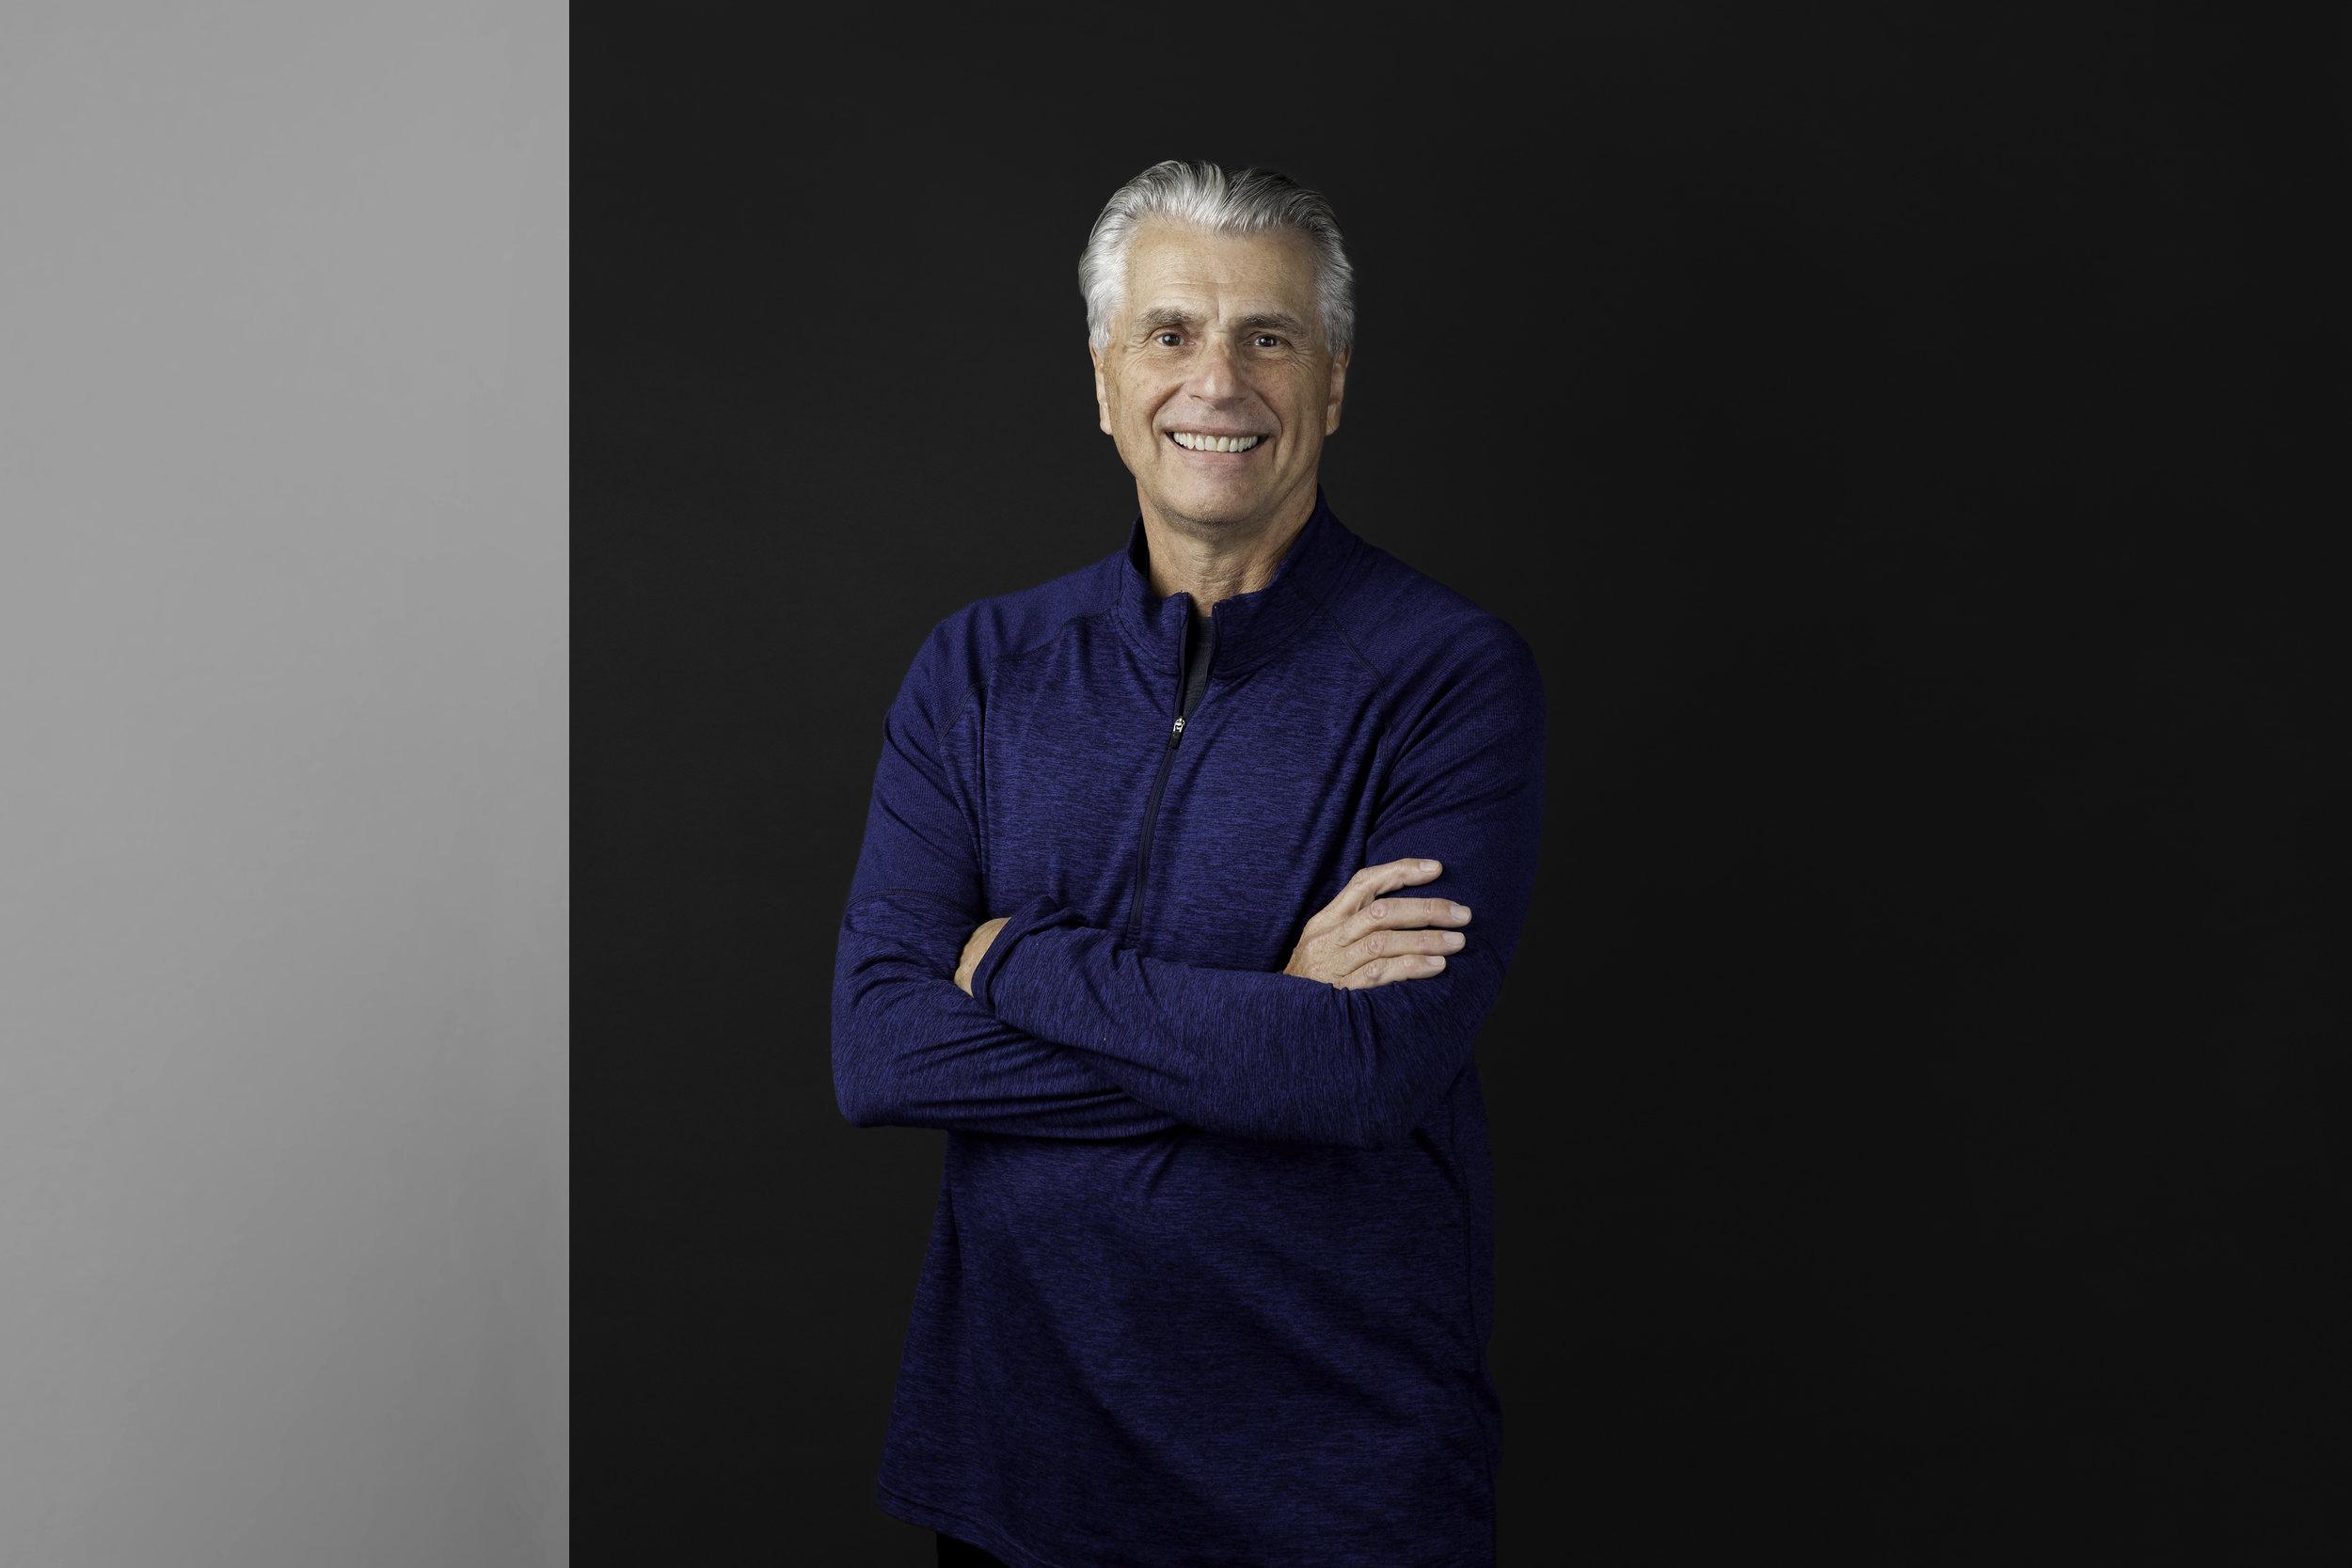 Dr Dan Baker - Venture Partner at OneVentures, leading Australian Venture Capital firm